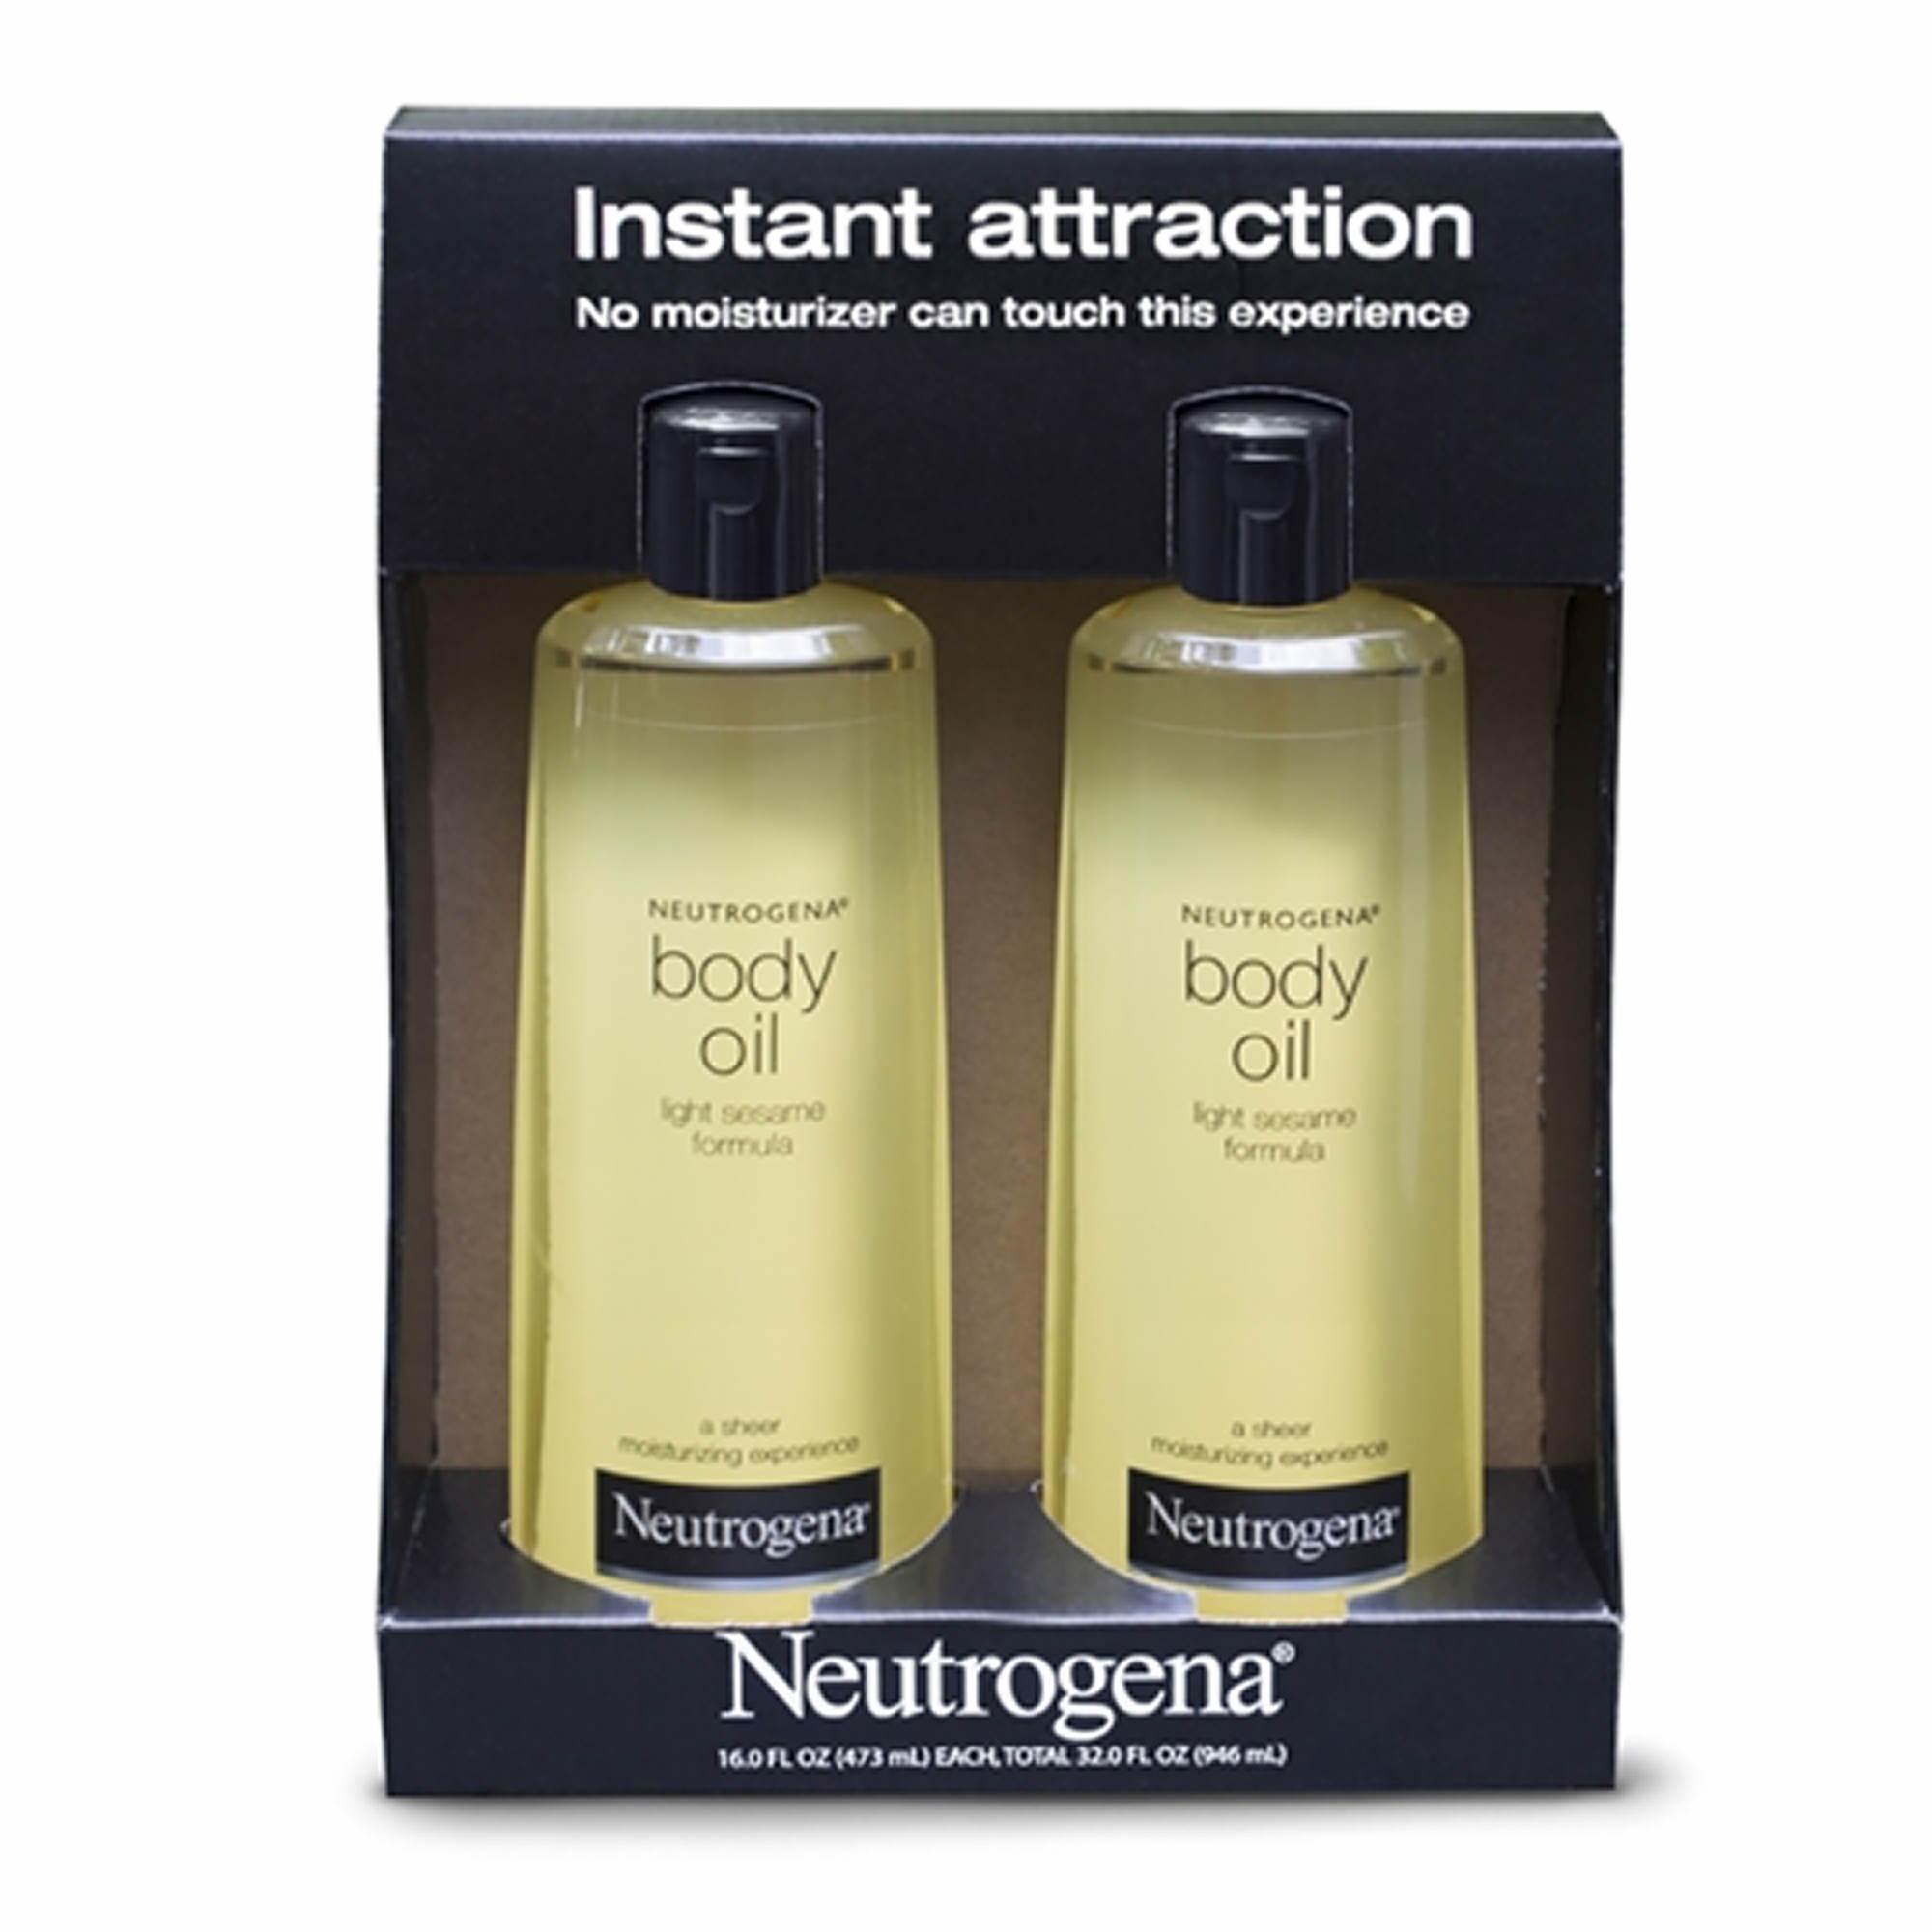 neutrogena light sesame formula body oil 2 pk 16 fl oz bj 39 s. Black Bedroom Furniture Sets. Home Design Ideas